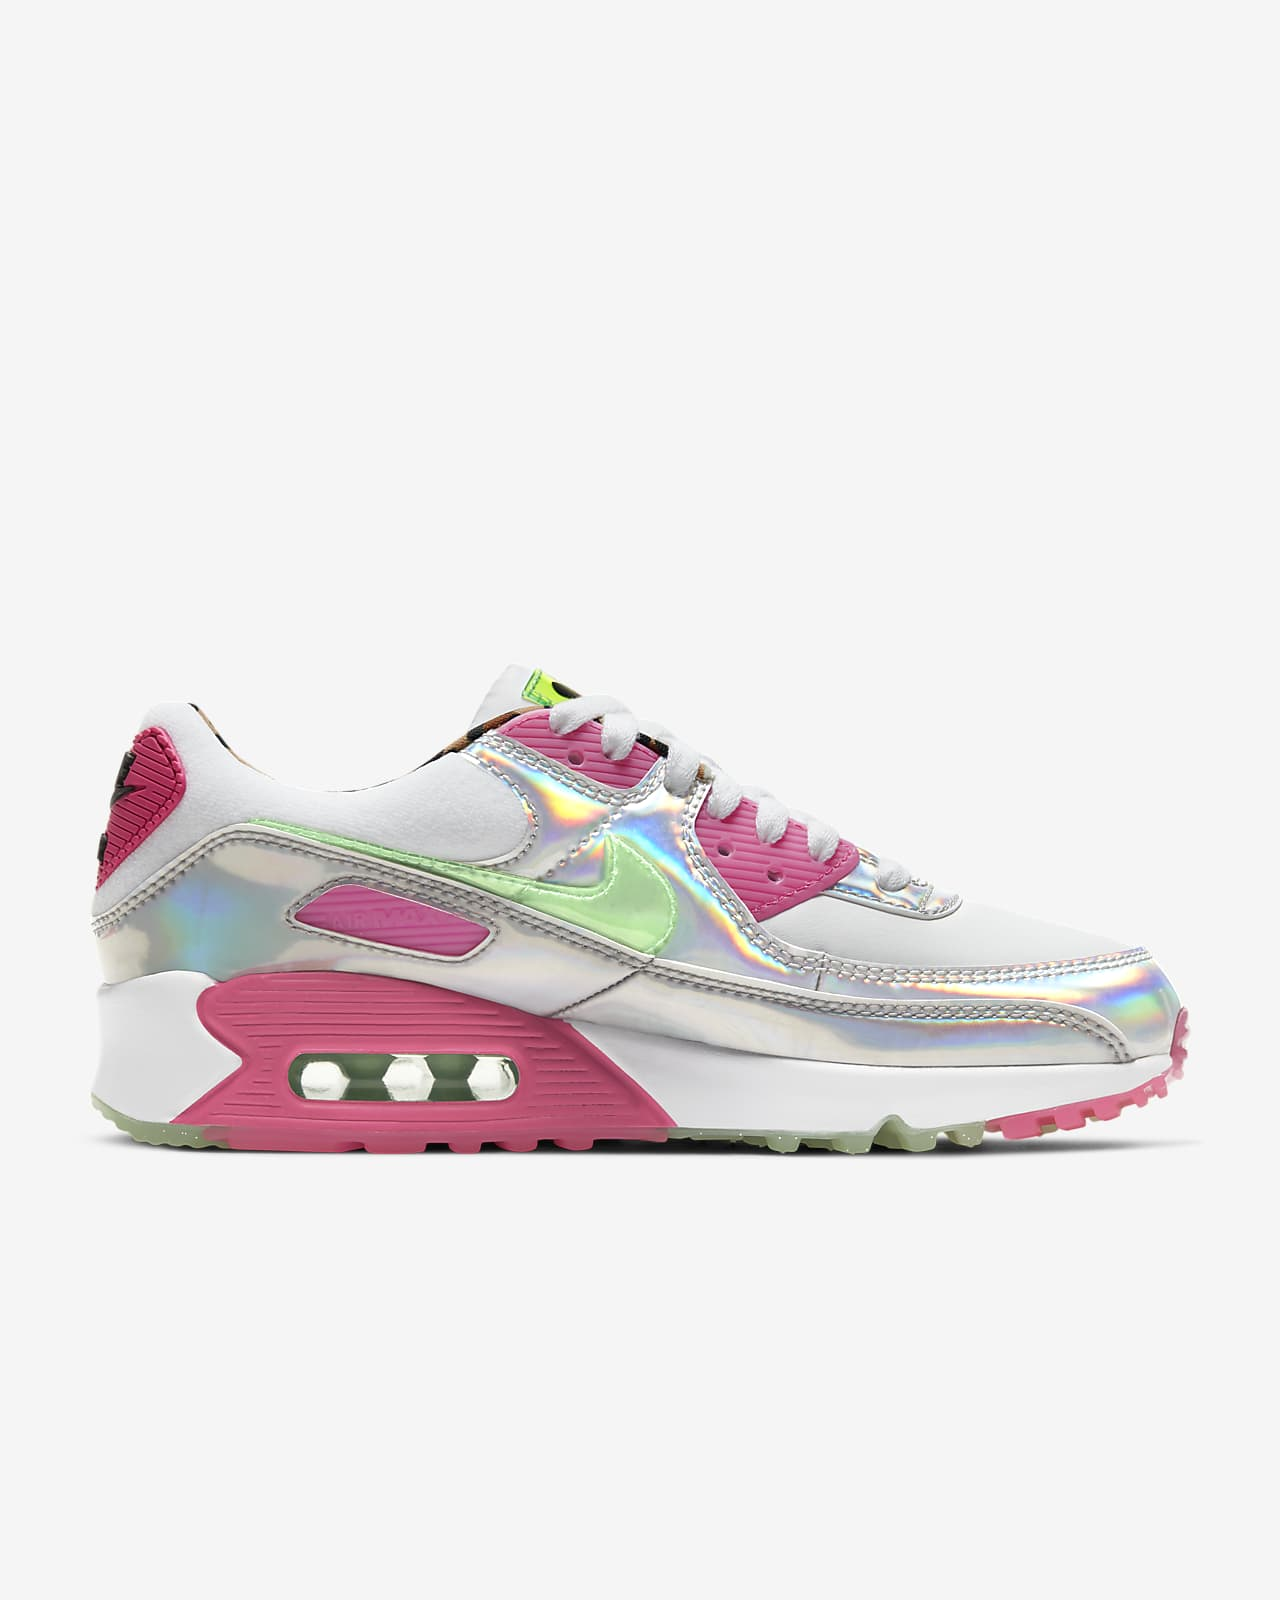 Nike Air Max 90 LX Women's Shoe